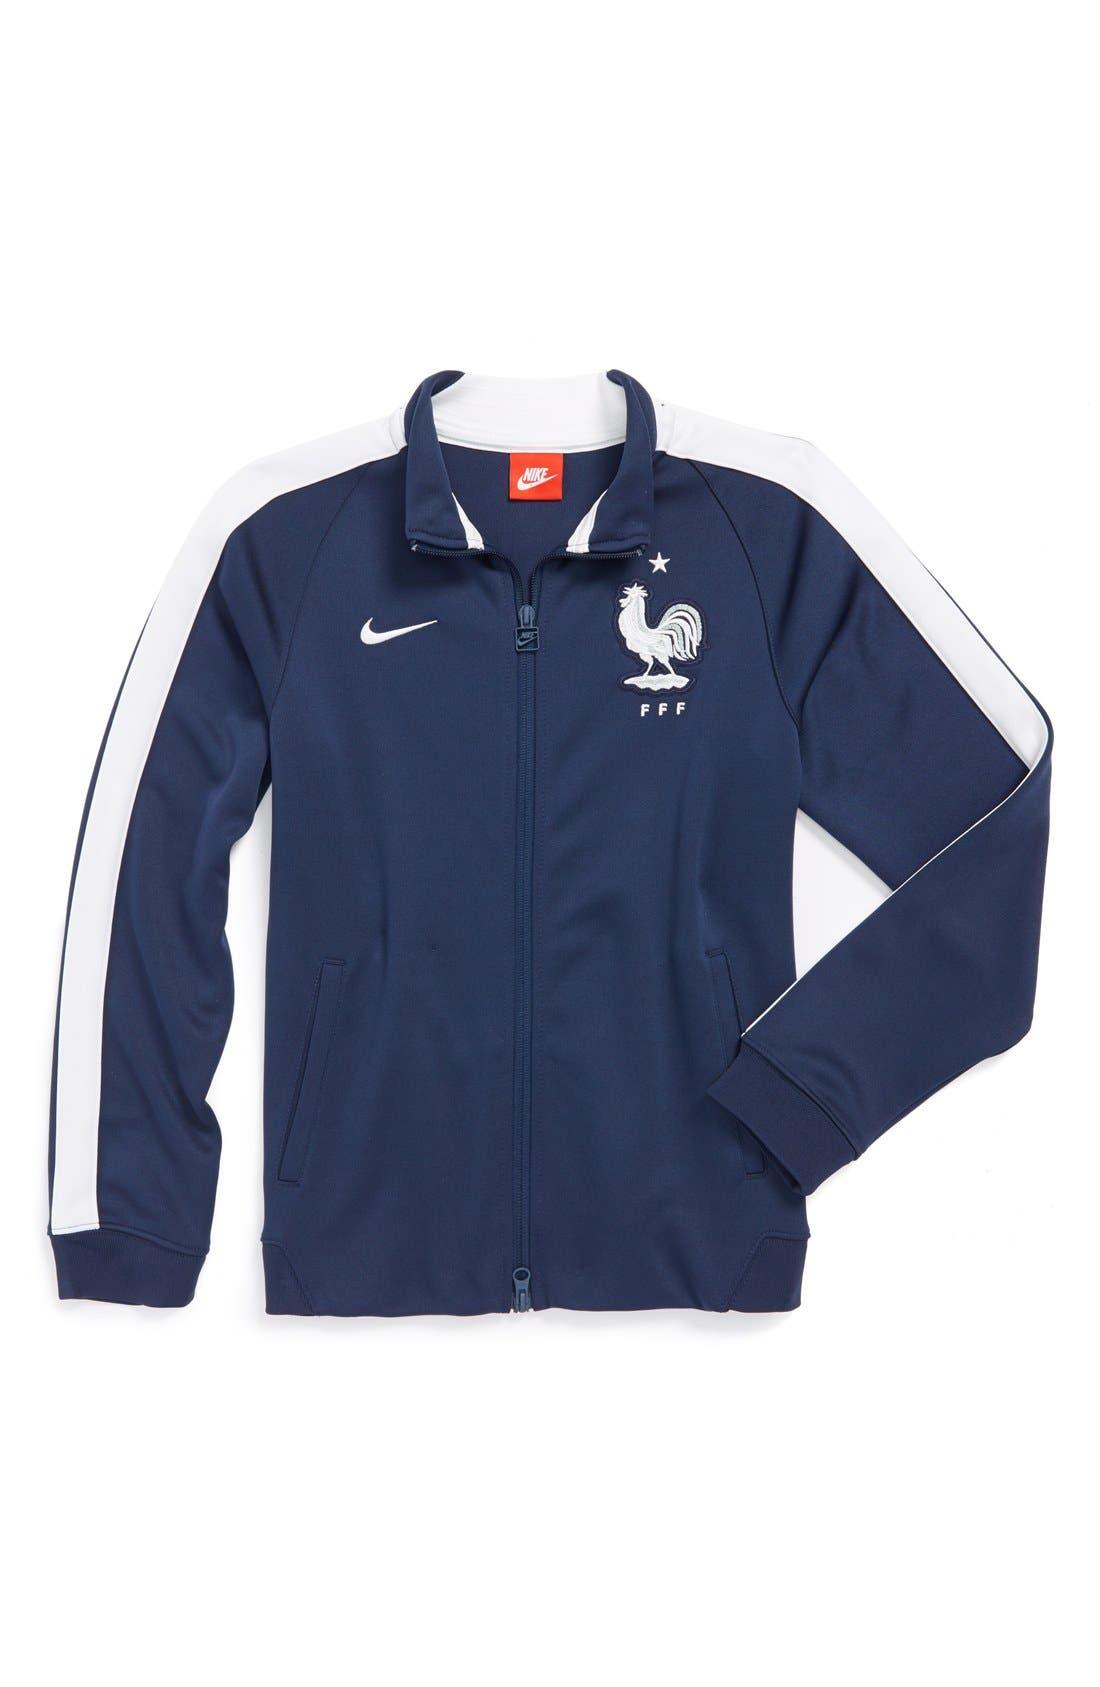 Alternate Image 1 Selected - Nike 'France FFF - N98 World Soccer Authentic' Track Jacket (Big Boys)